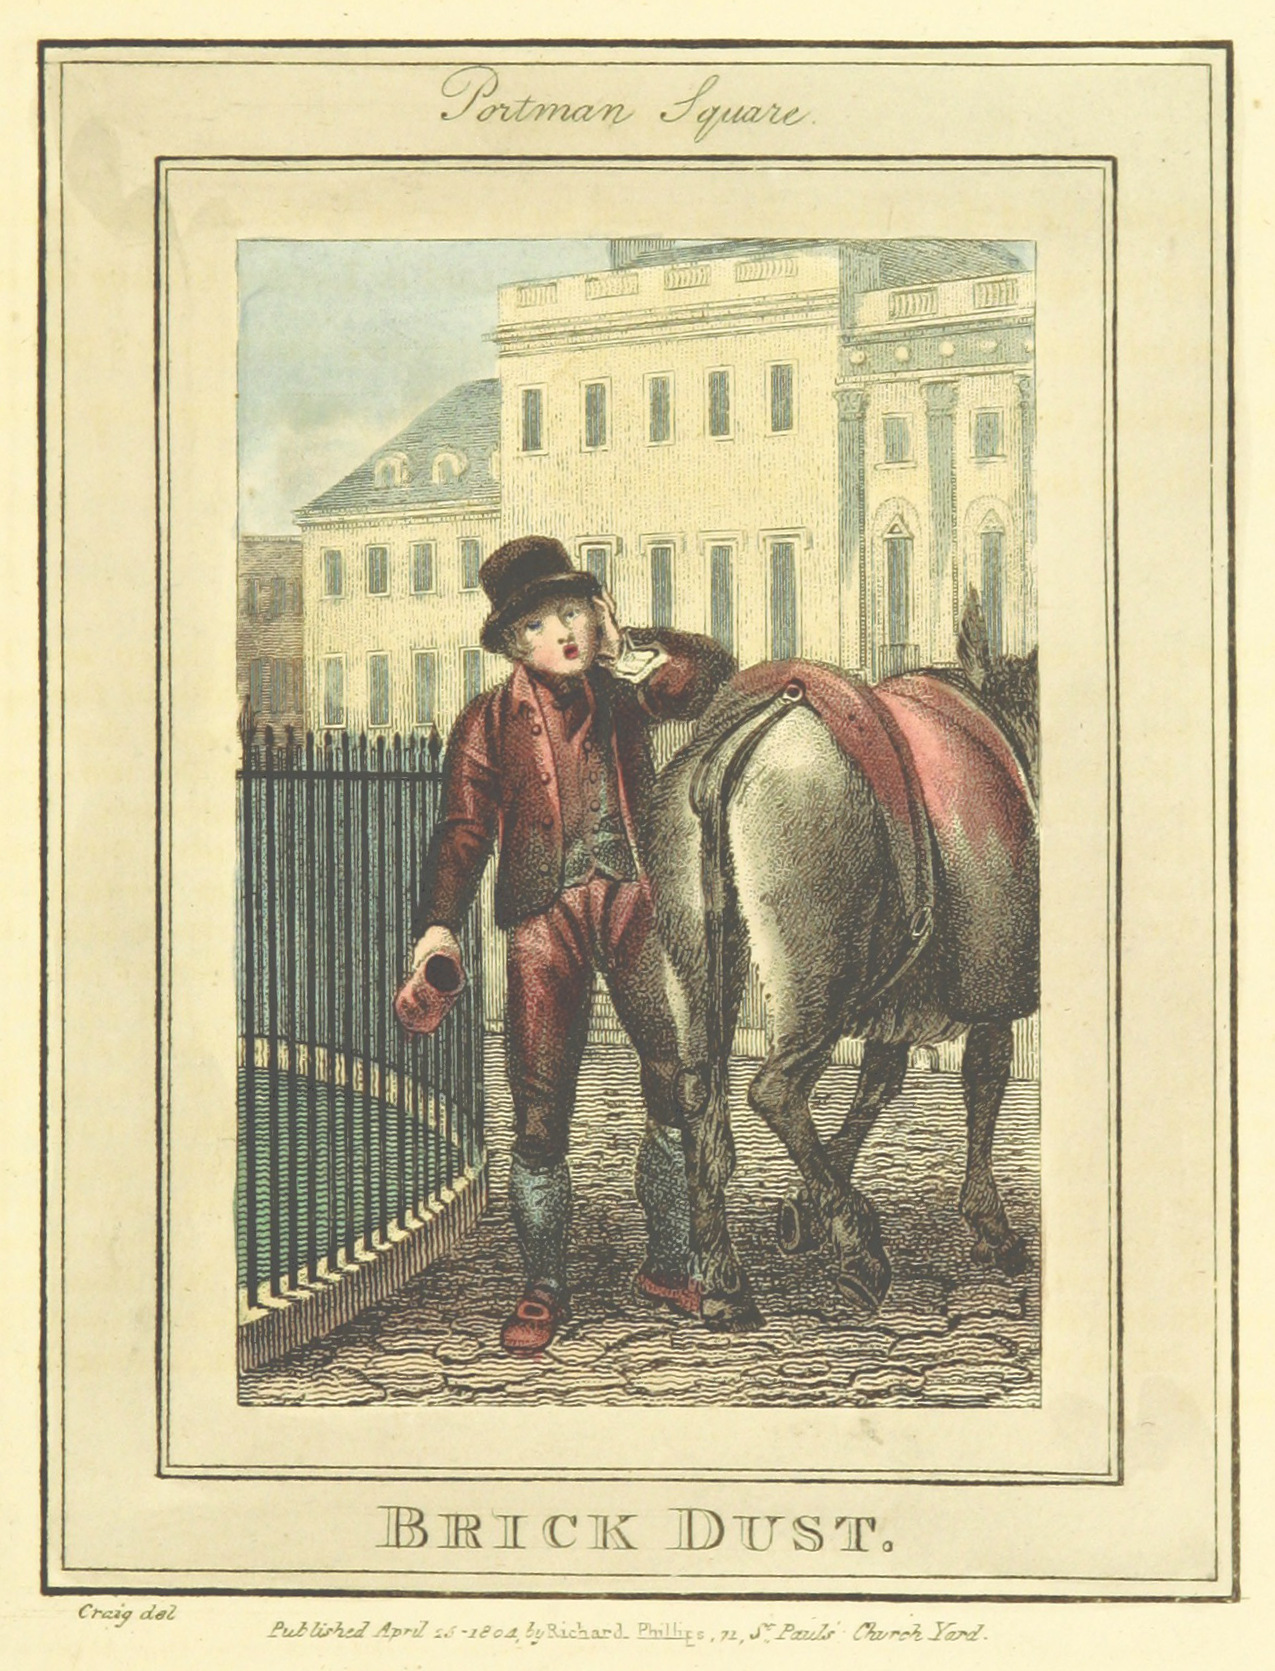 Phillips(1804)_p569_-_Portman_Square_-_Brick_Dust